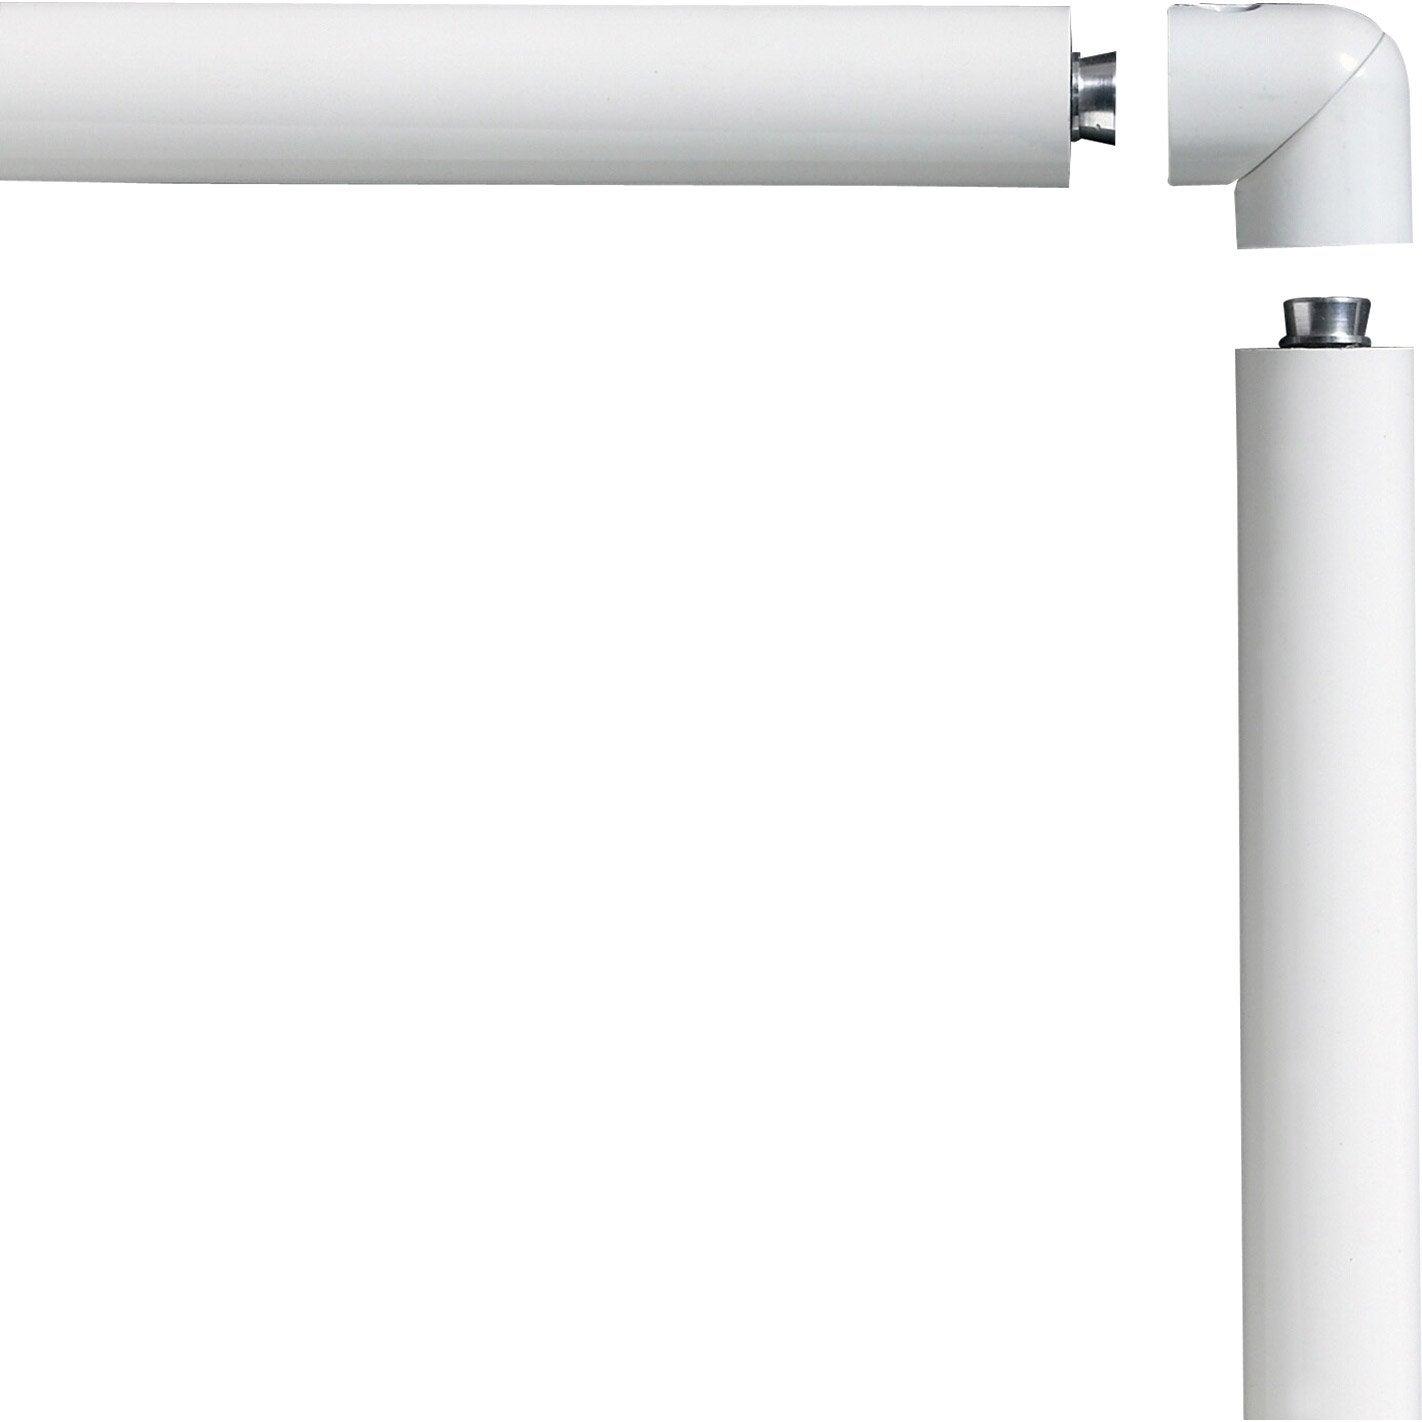 Main courante aluminium blanc obapi 2 m leroy merlin - Platte aluminium leroy merlin ...